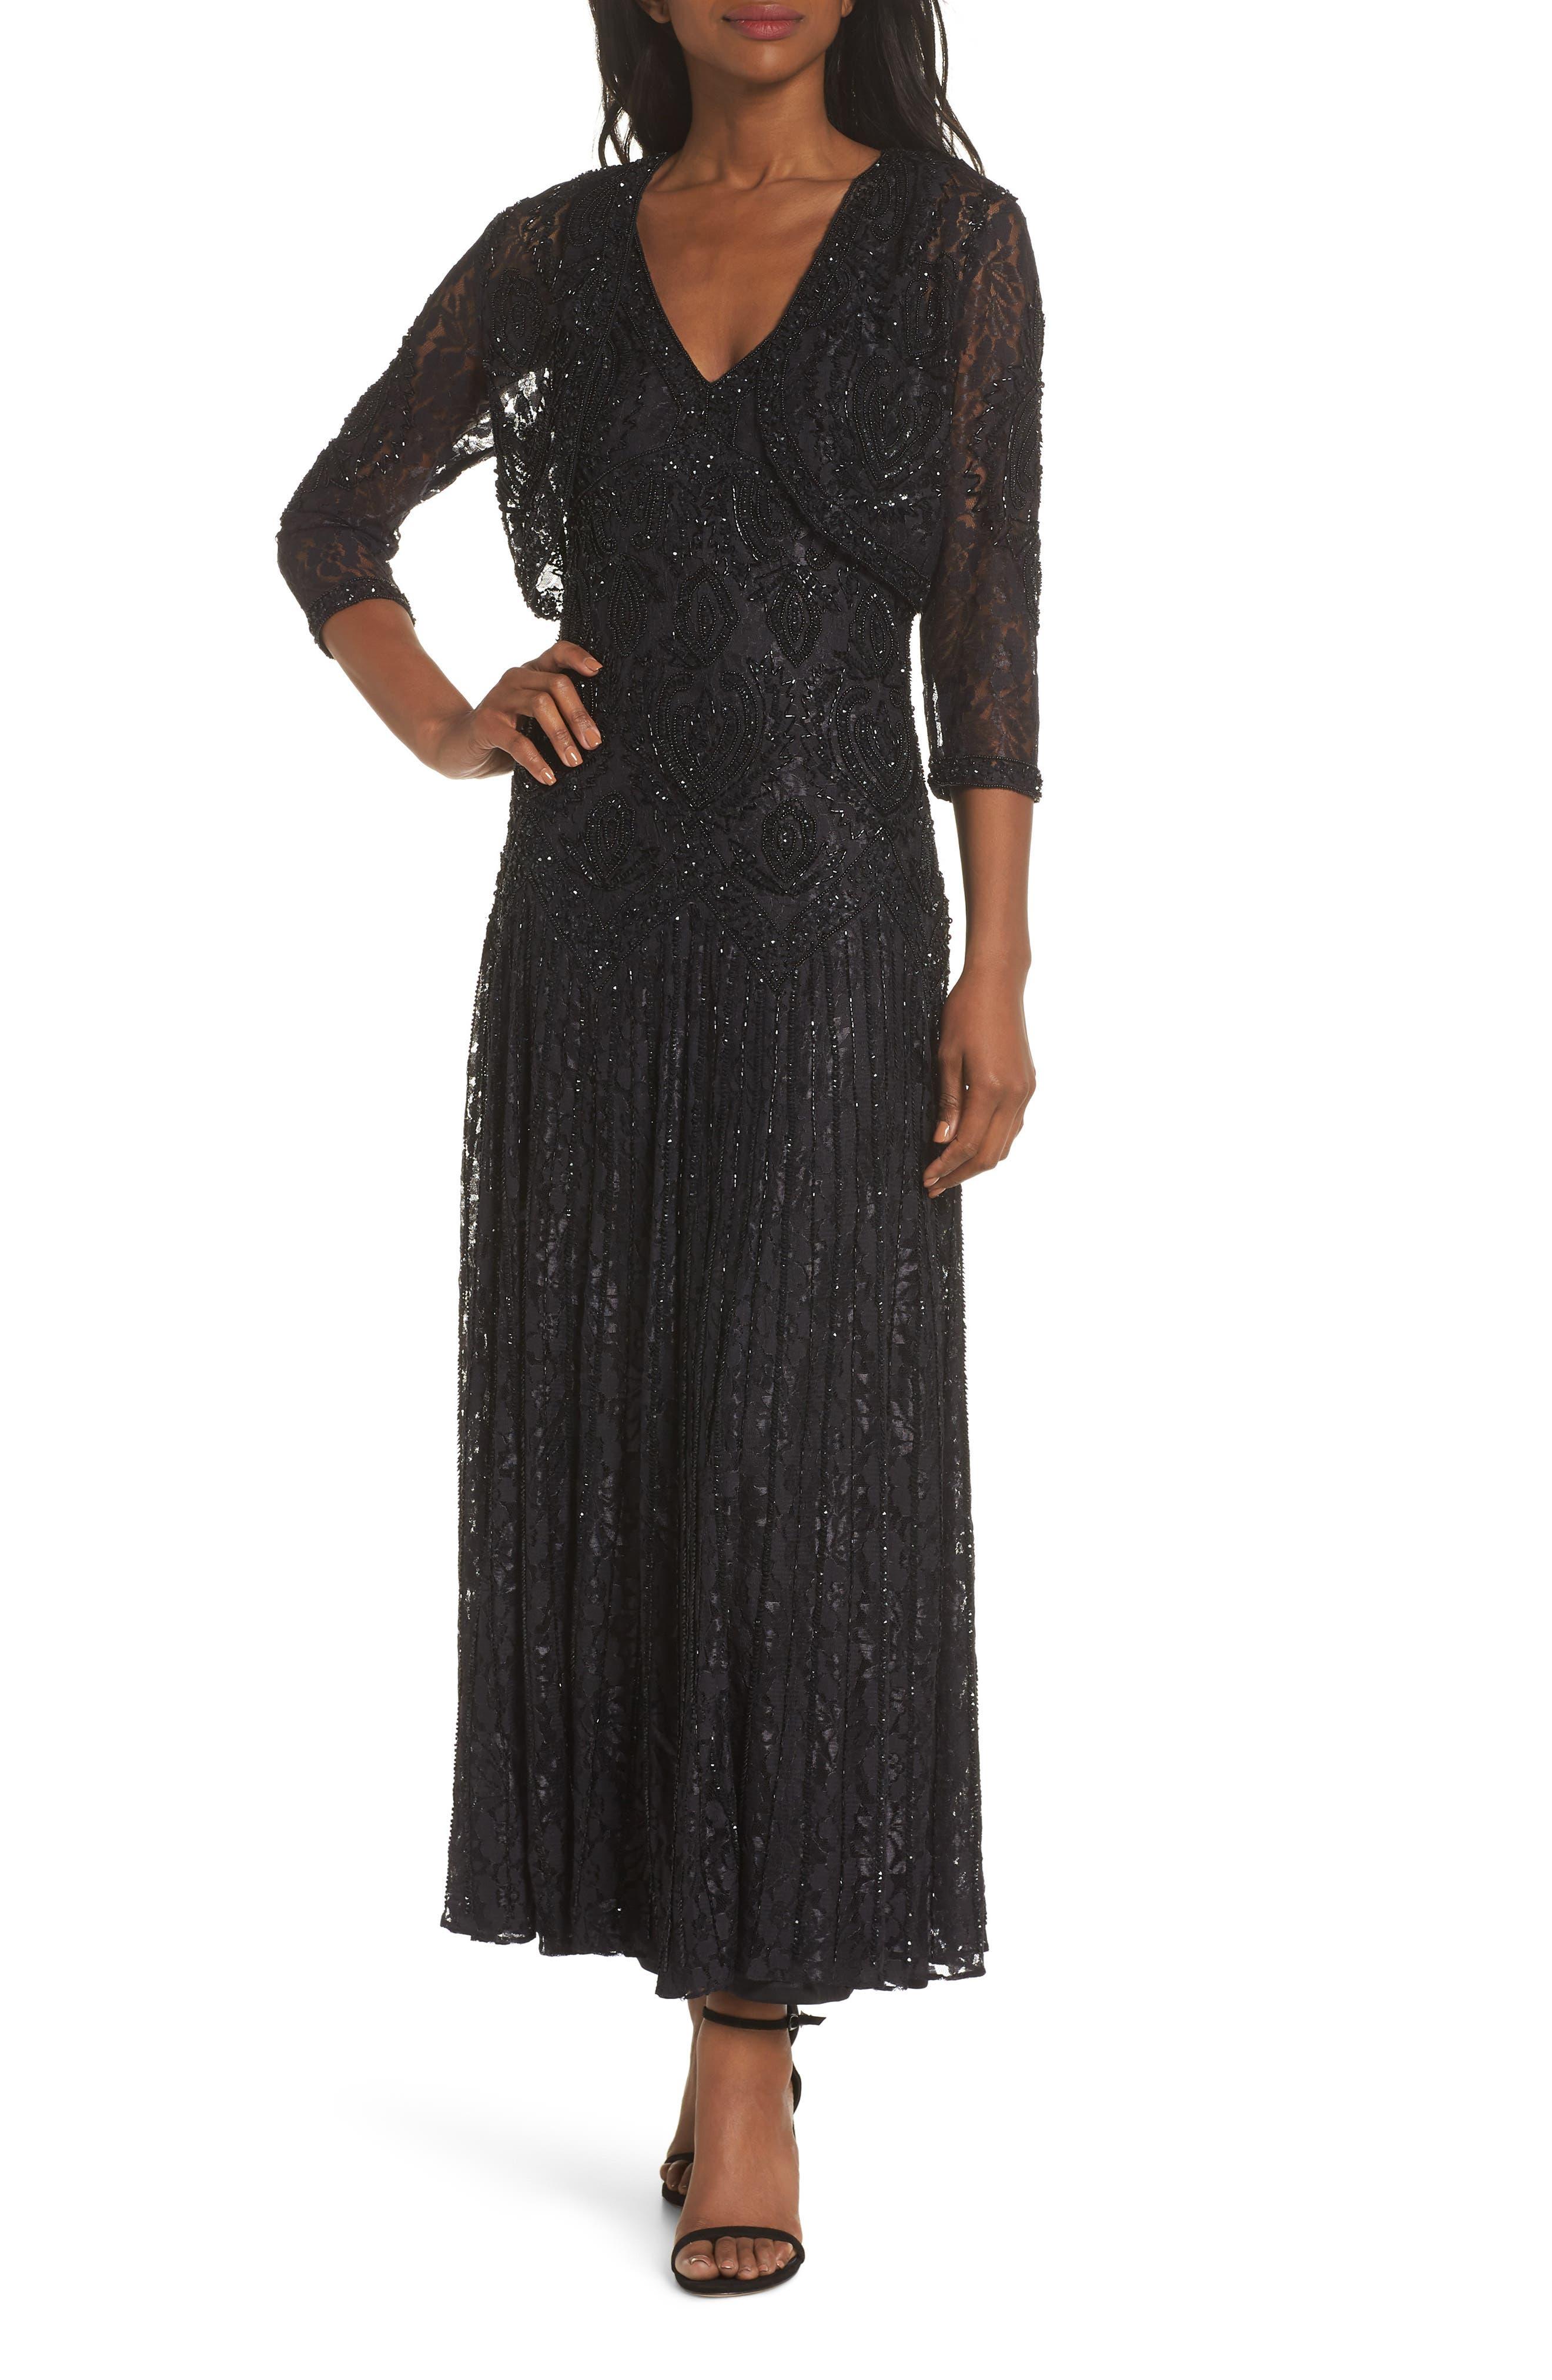 Pisarro Nights Beaded Lace Evening Dress With Bolero, Black